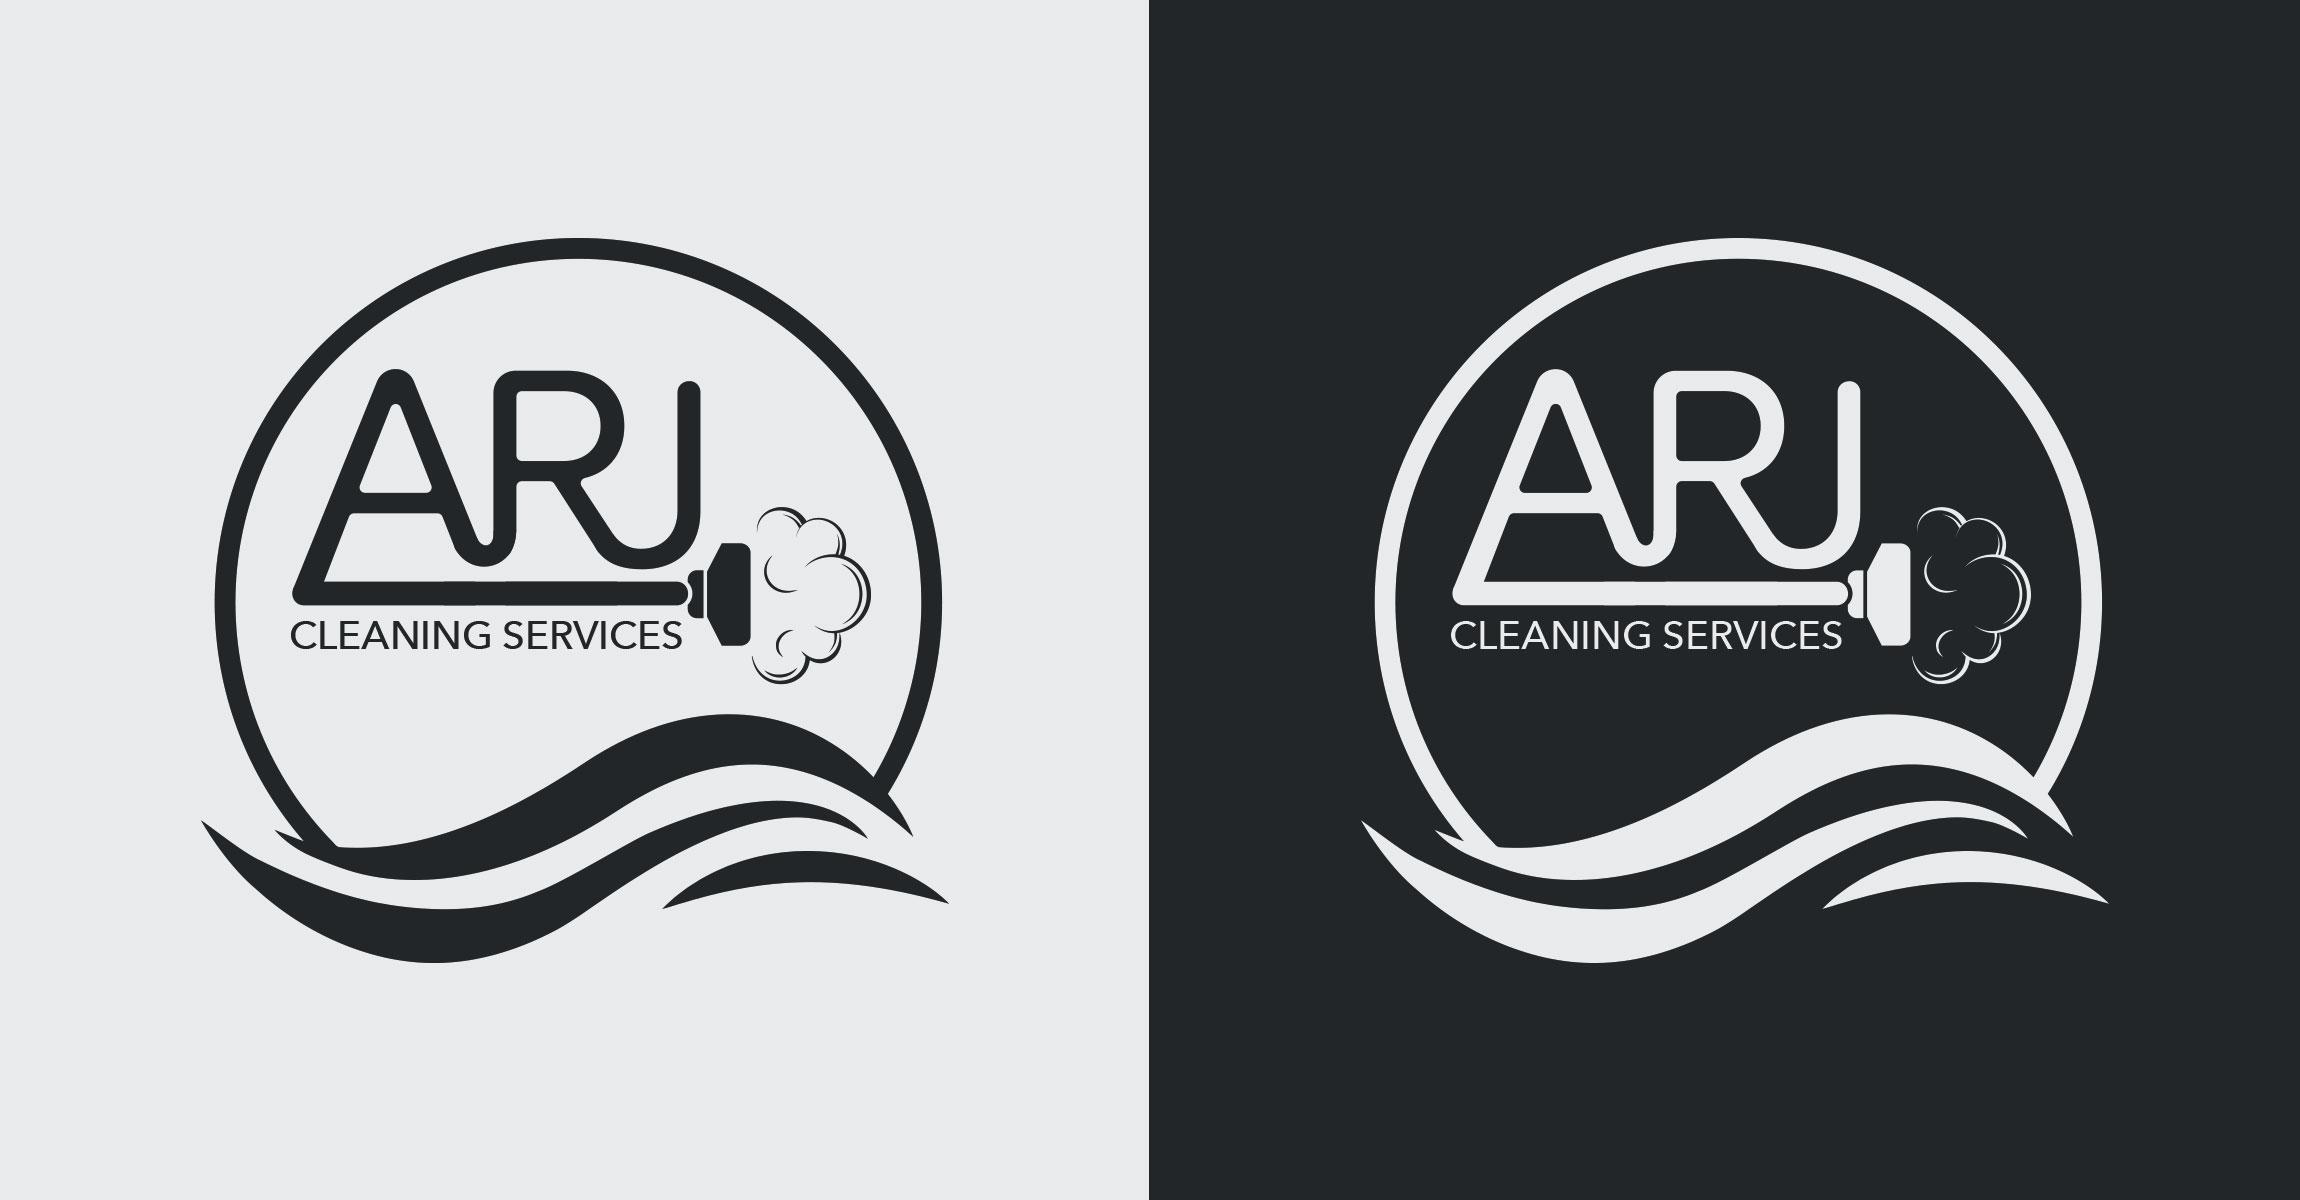 arj-black-and-white